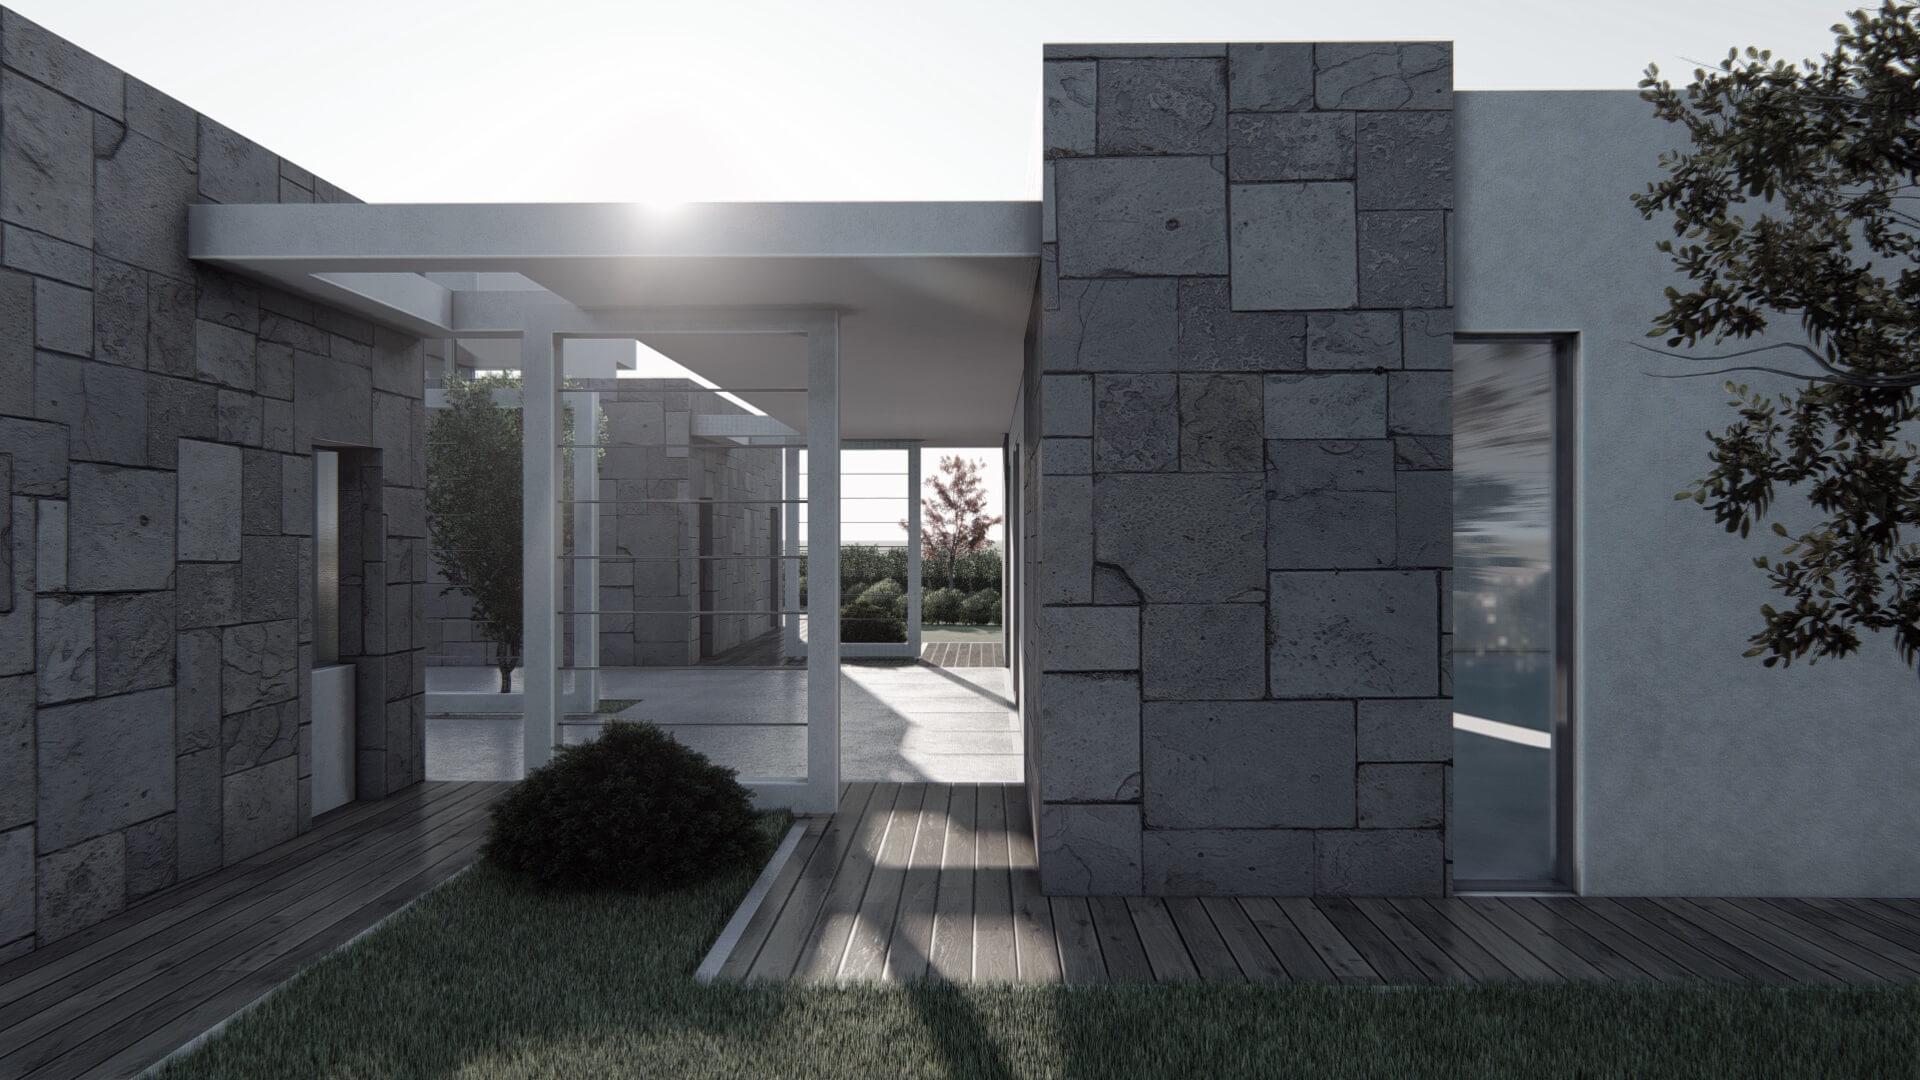 auredesign.com_progettti_residential_villas_3